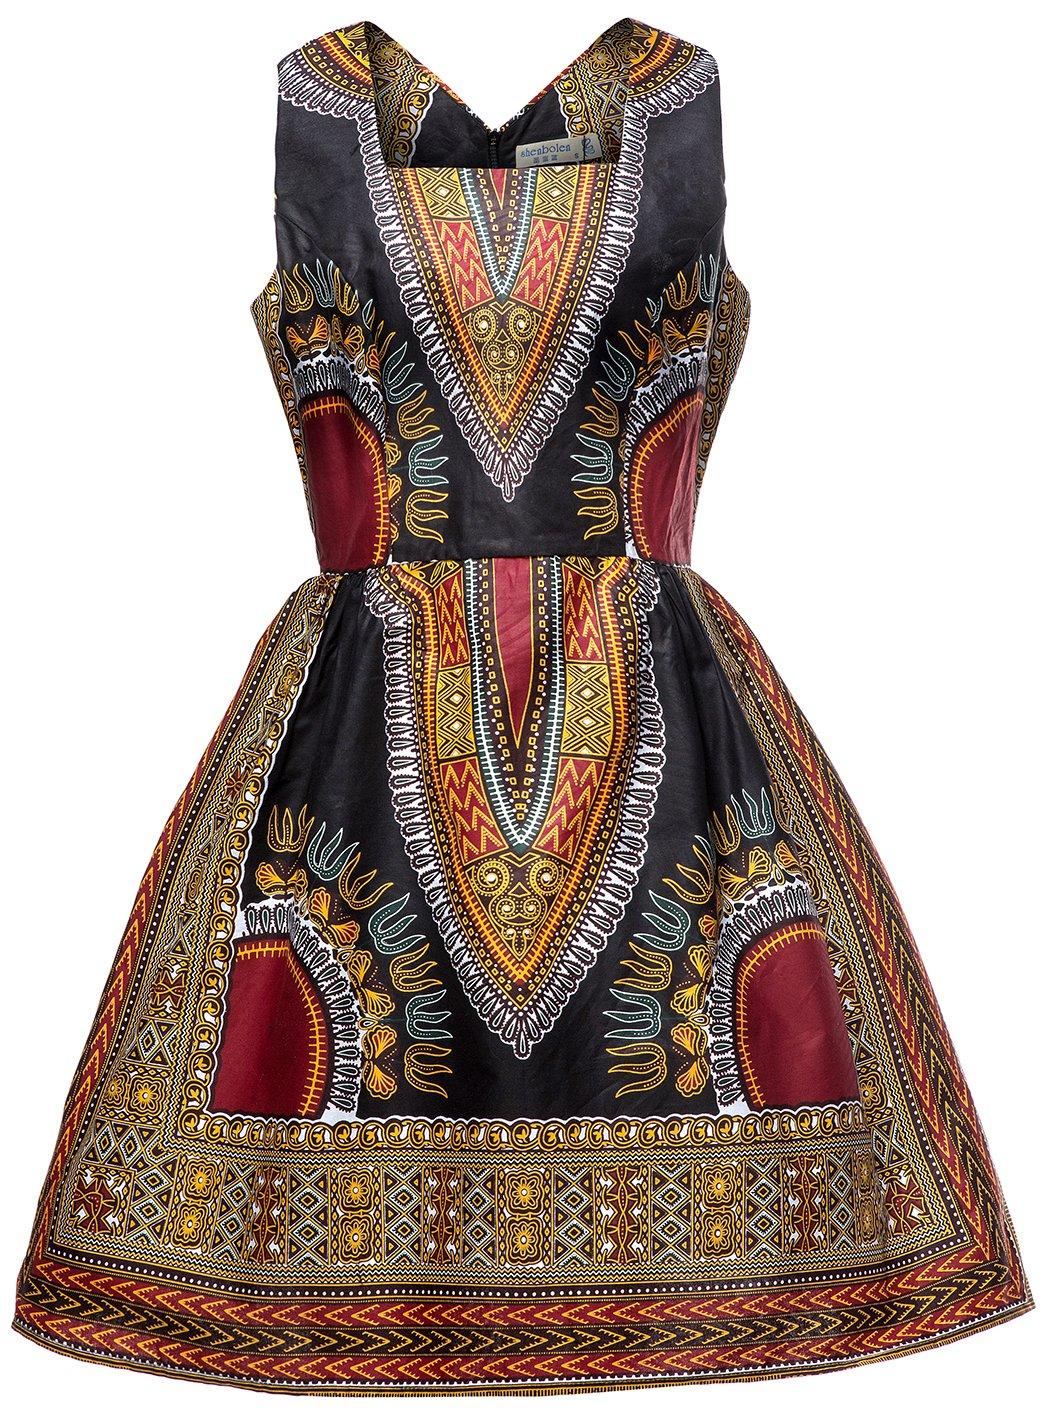 Shenbolen Woman African Print Dress Dashiki Traditional Dress Party Dresses